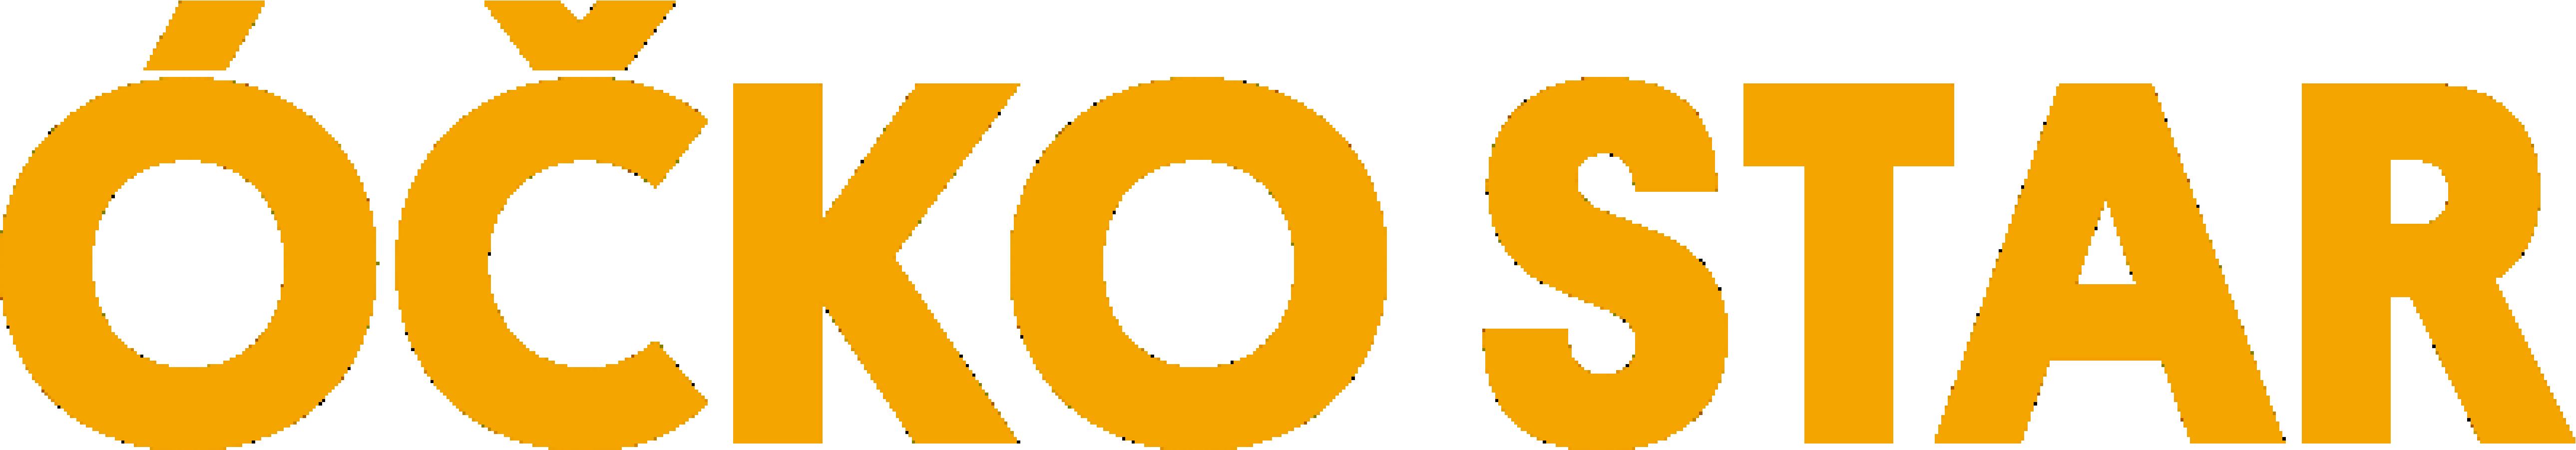 OckoStar.cz